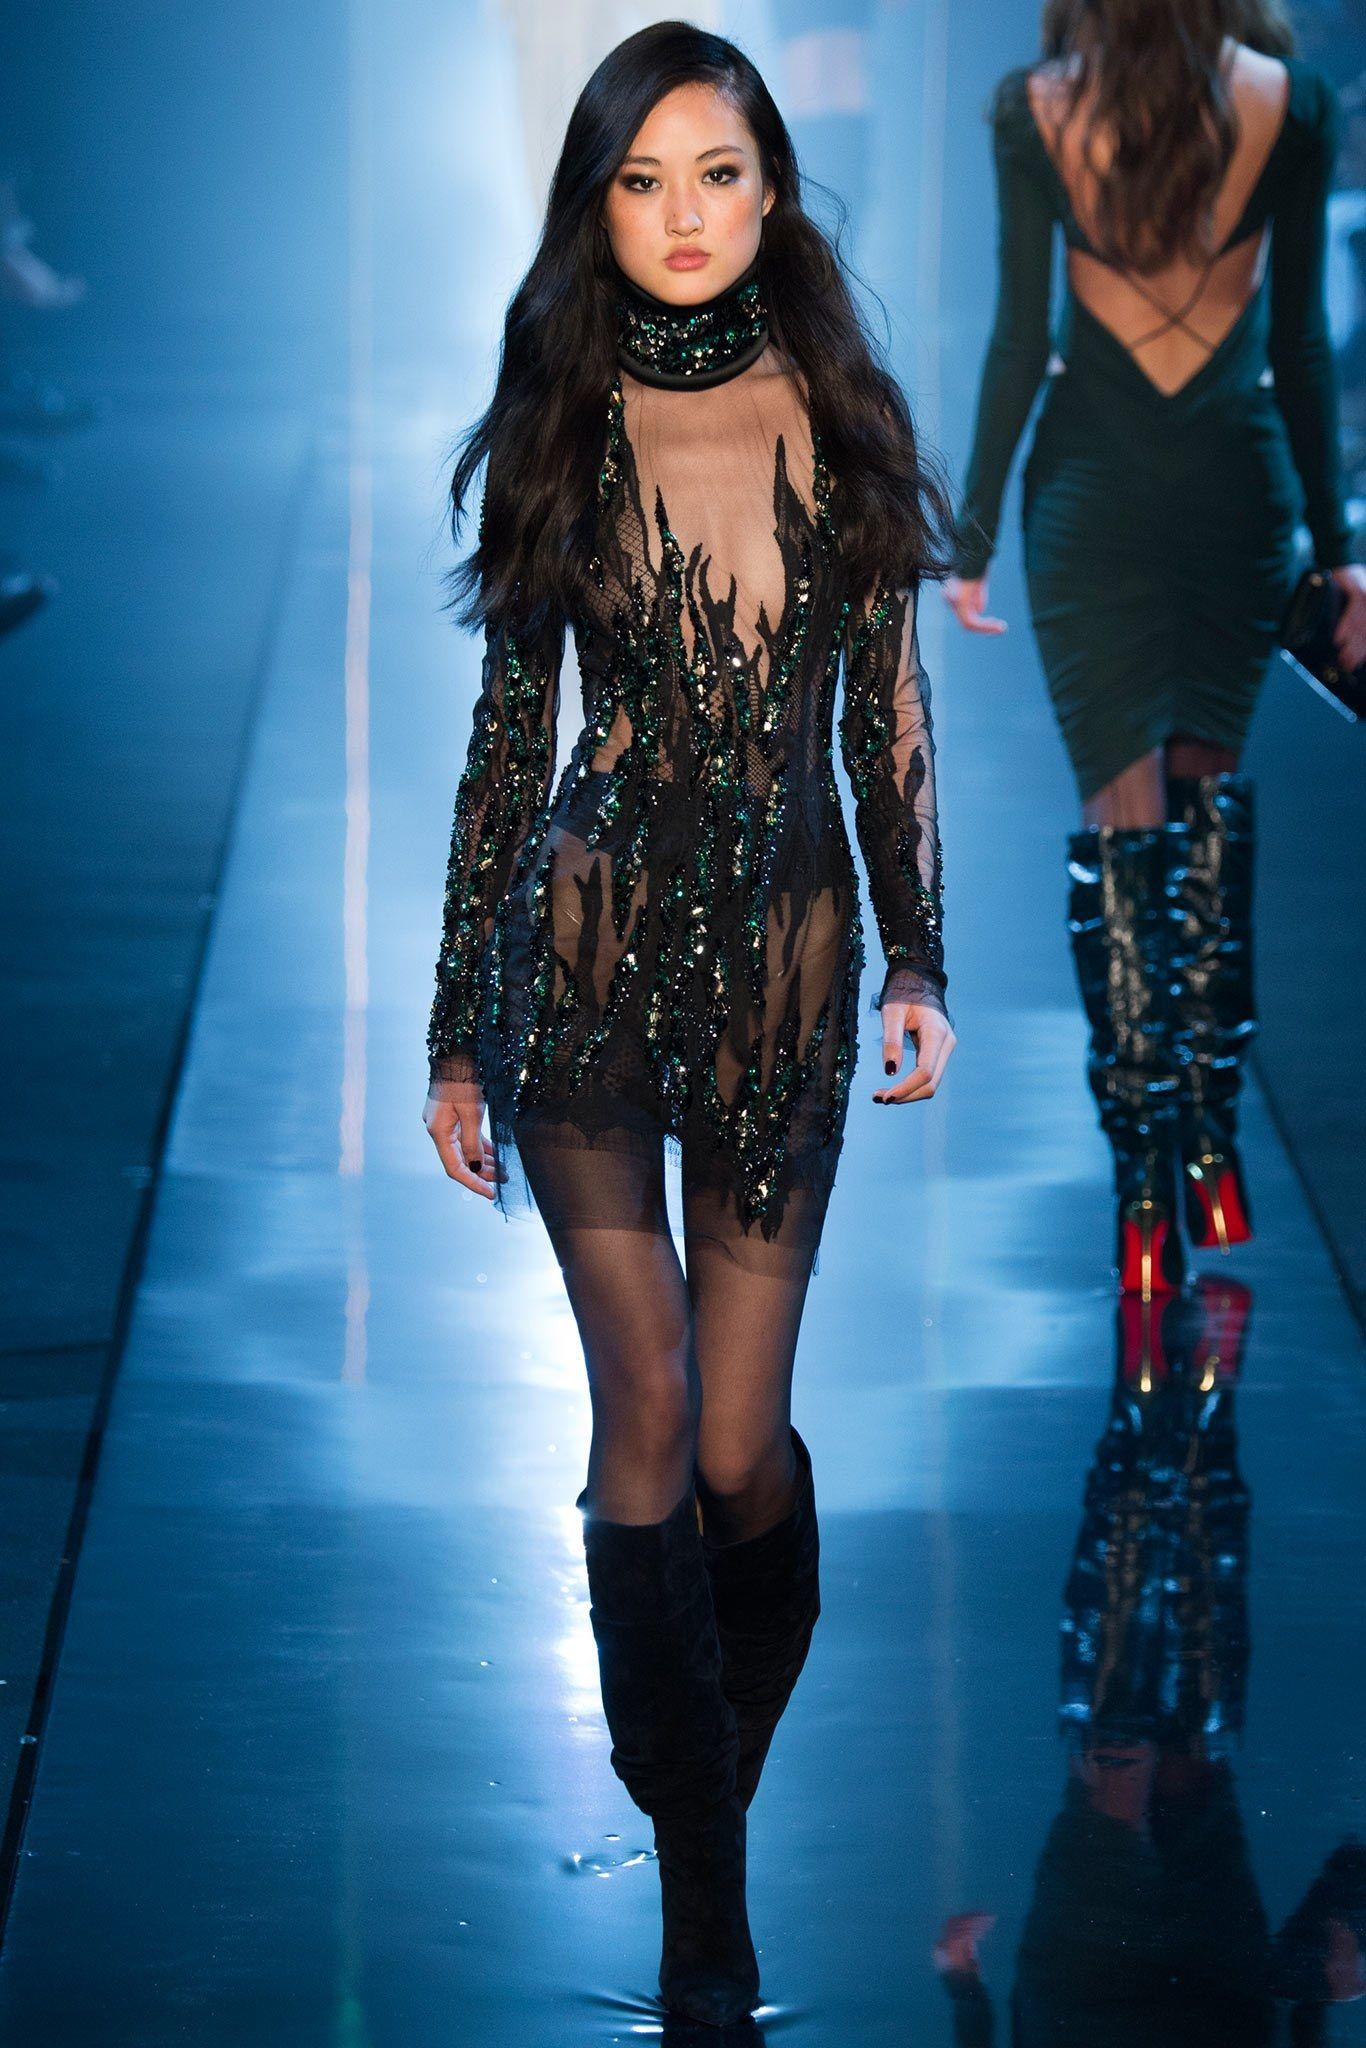 Alexandre Vauthier Spring 2015 Couture Fashion Show - Jing Wen (Elite)